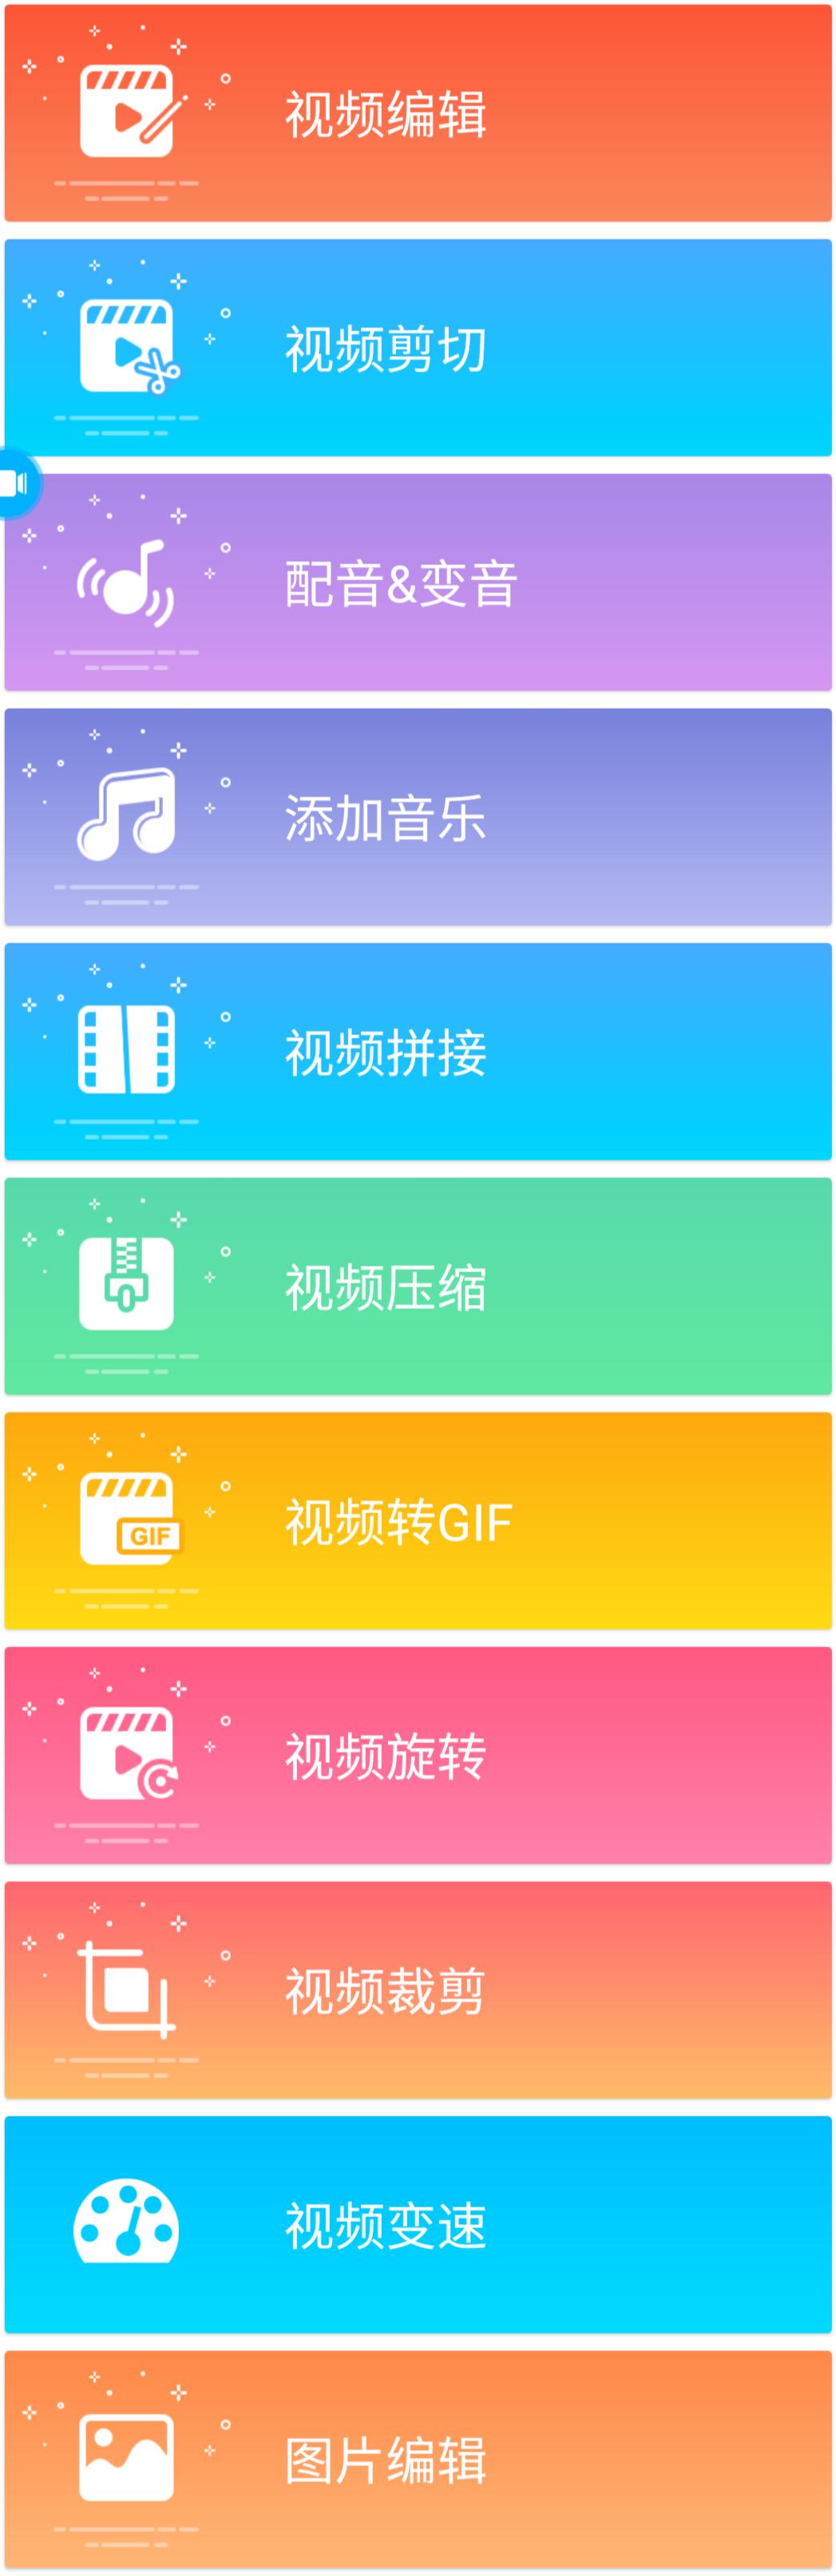 [Android]超级录屏工具,可对录制进行编辑图片 No.3